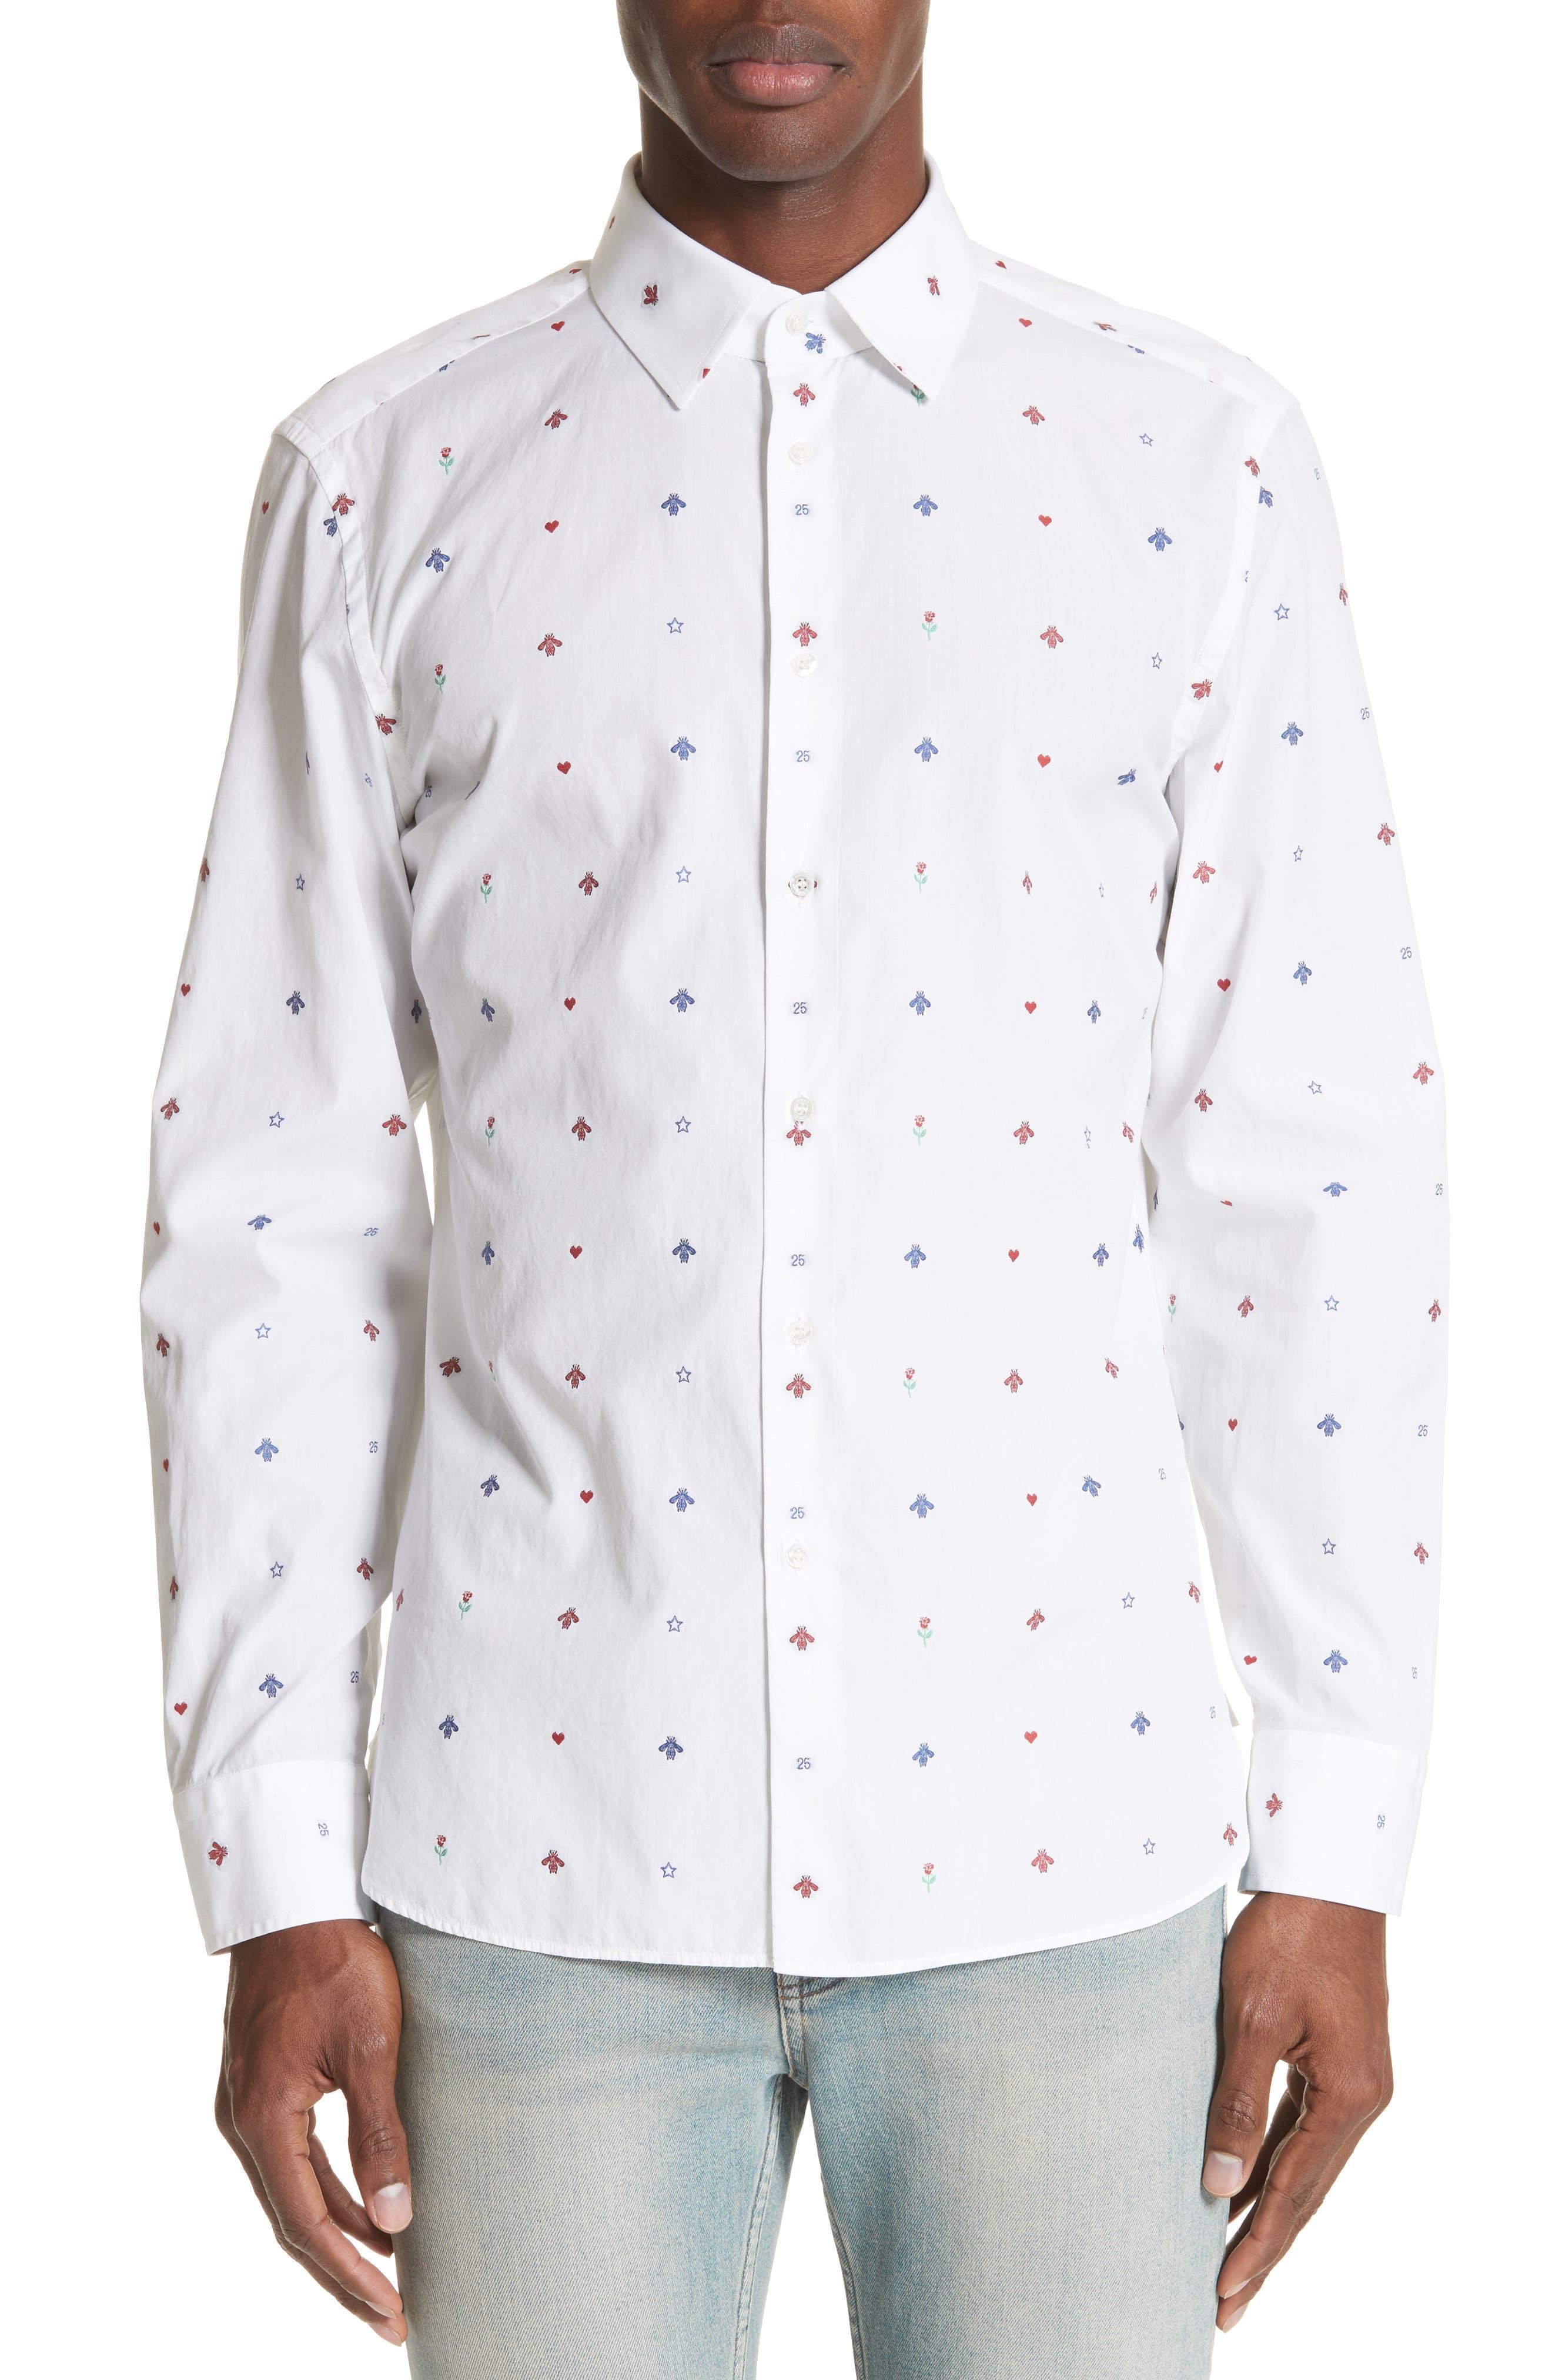 Allover Bee Print Woven Shirt,                         Main,                         color, 9000 White